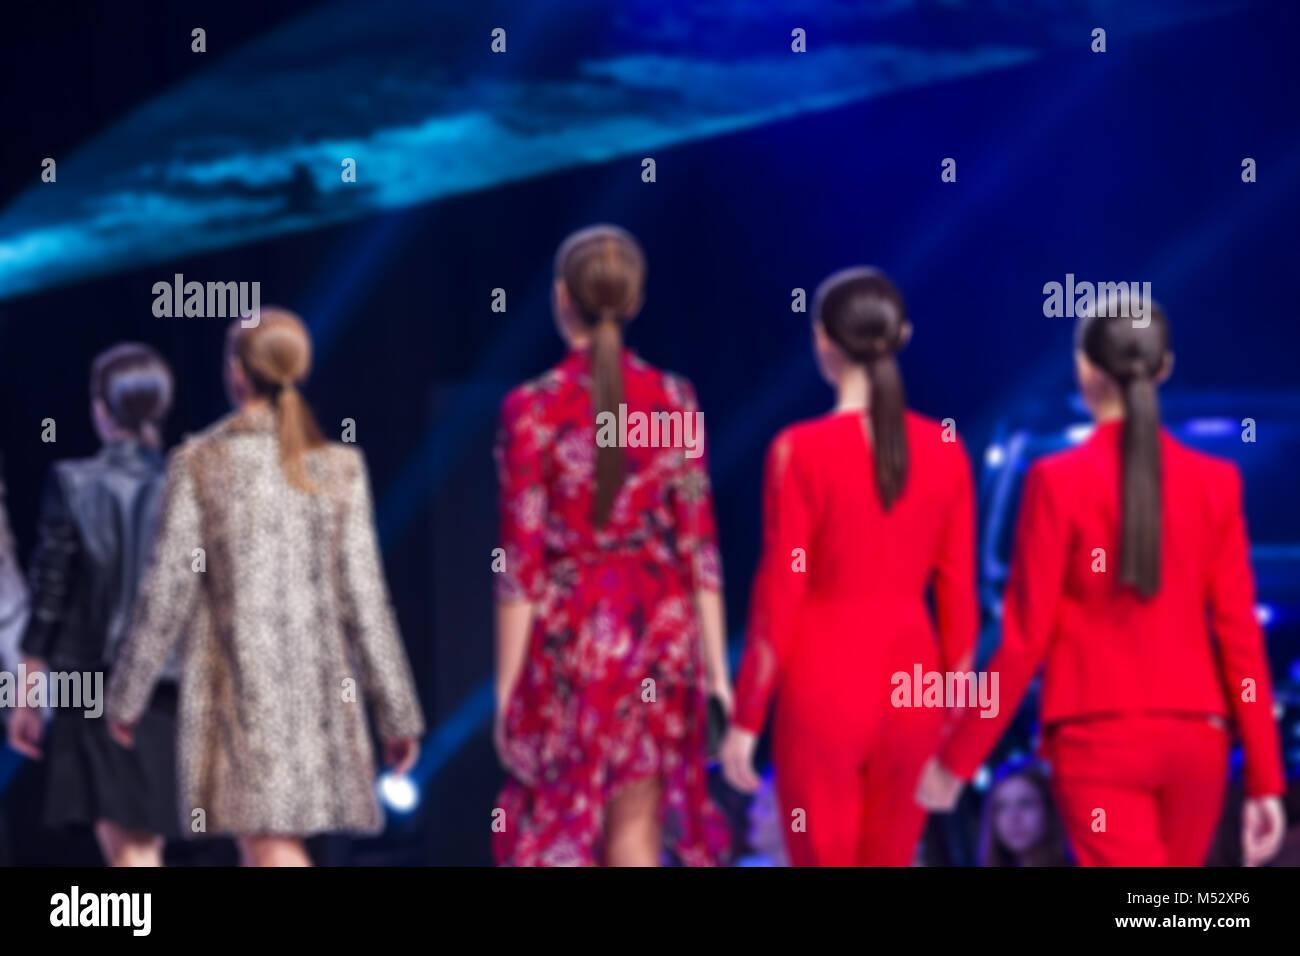 Sofia Fashion Week weibliche Modelle Rückseiten rot passt Stockbild